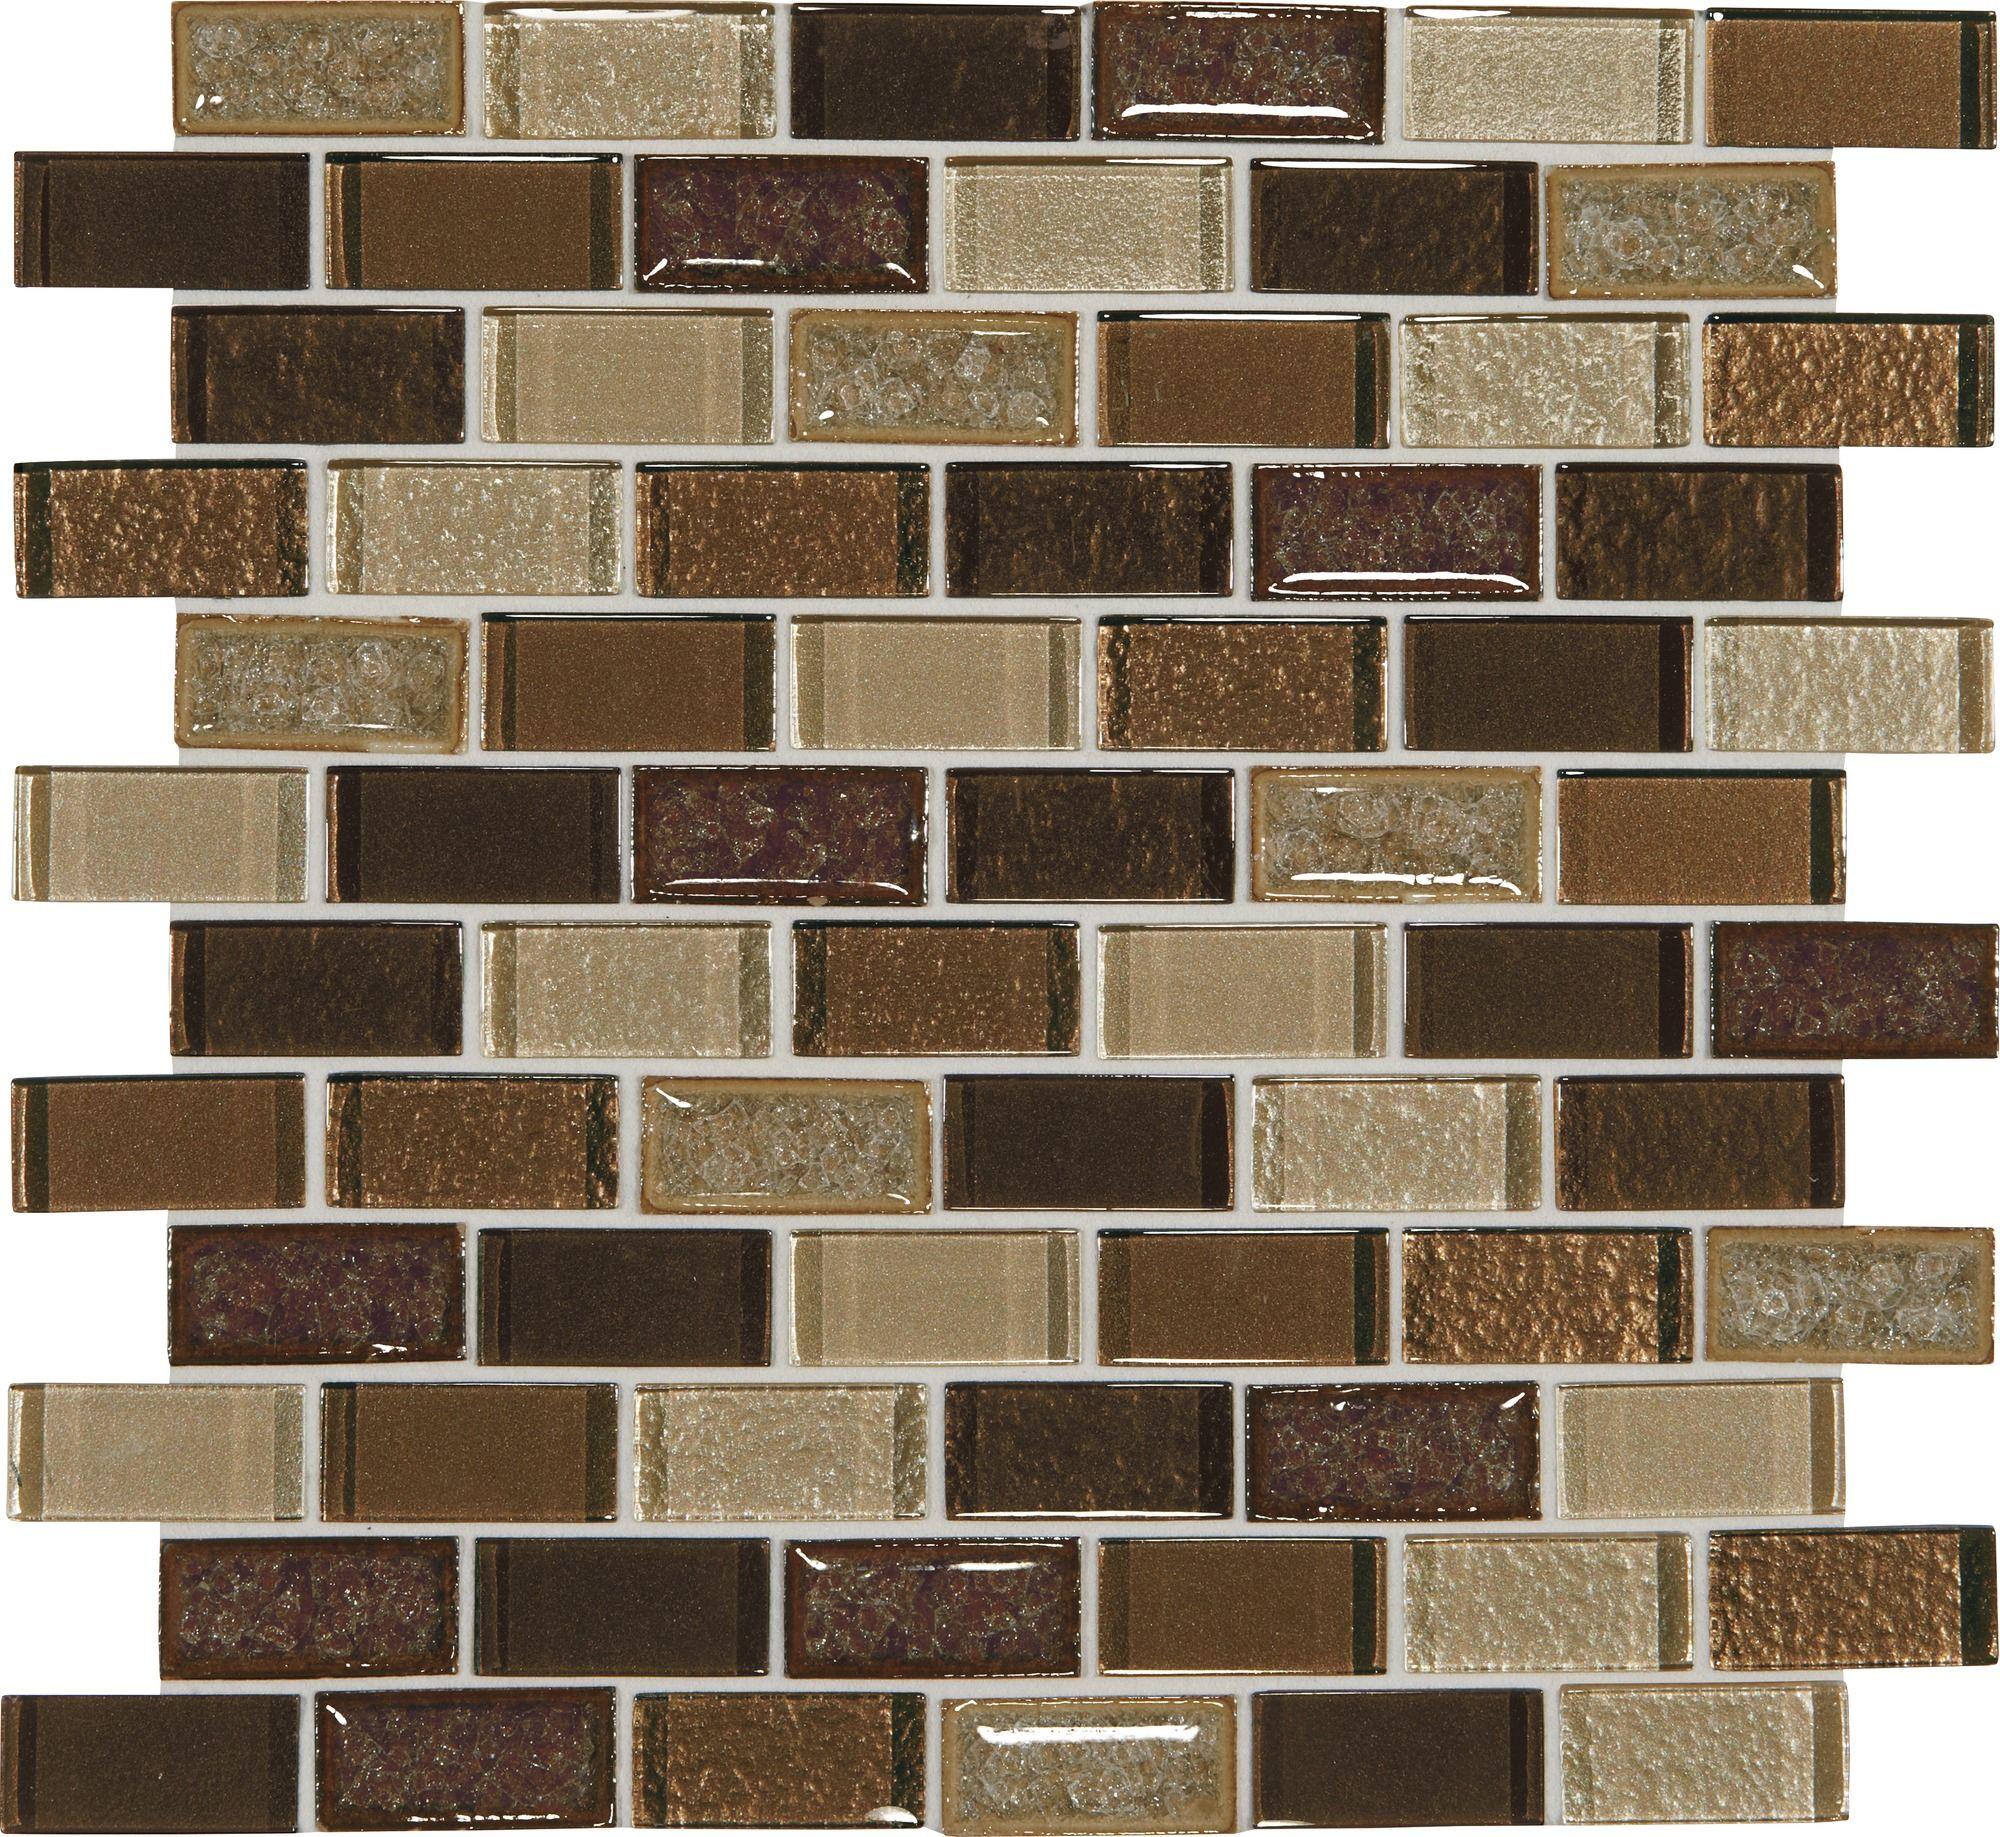 Crystal Shores Copper Coast 12x13 Brick-Joint Blended Mosaic Tile